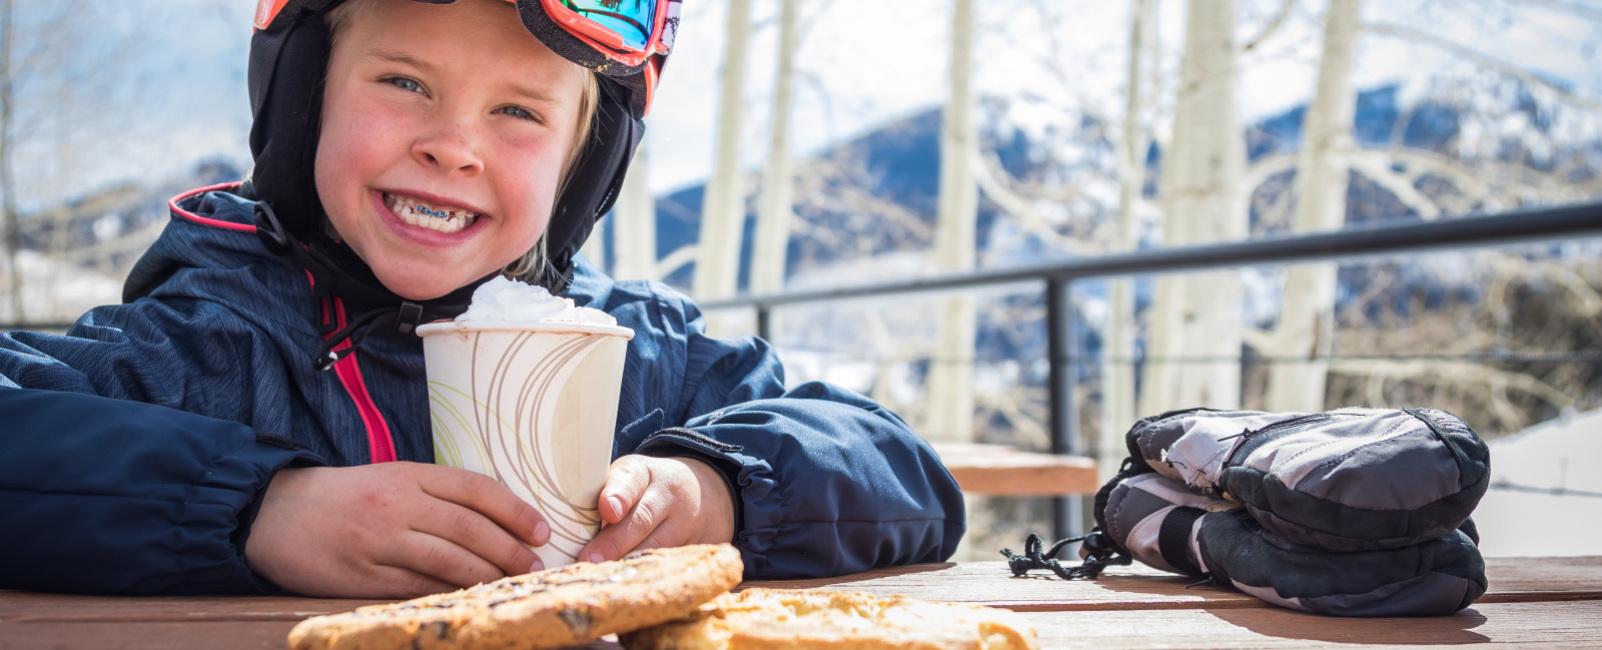 Ski Utah's Grab & Go Dining and Restaurant Guide